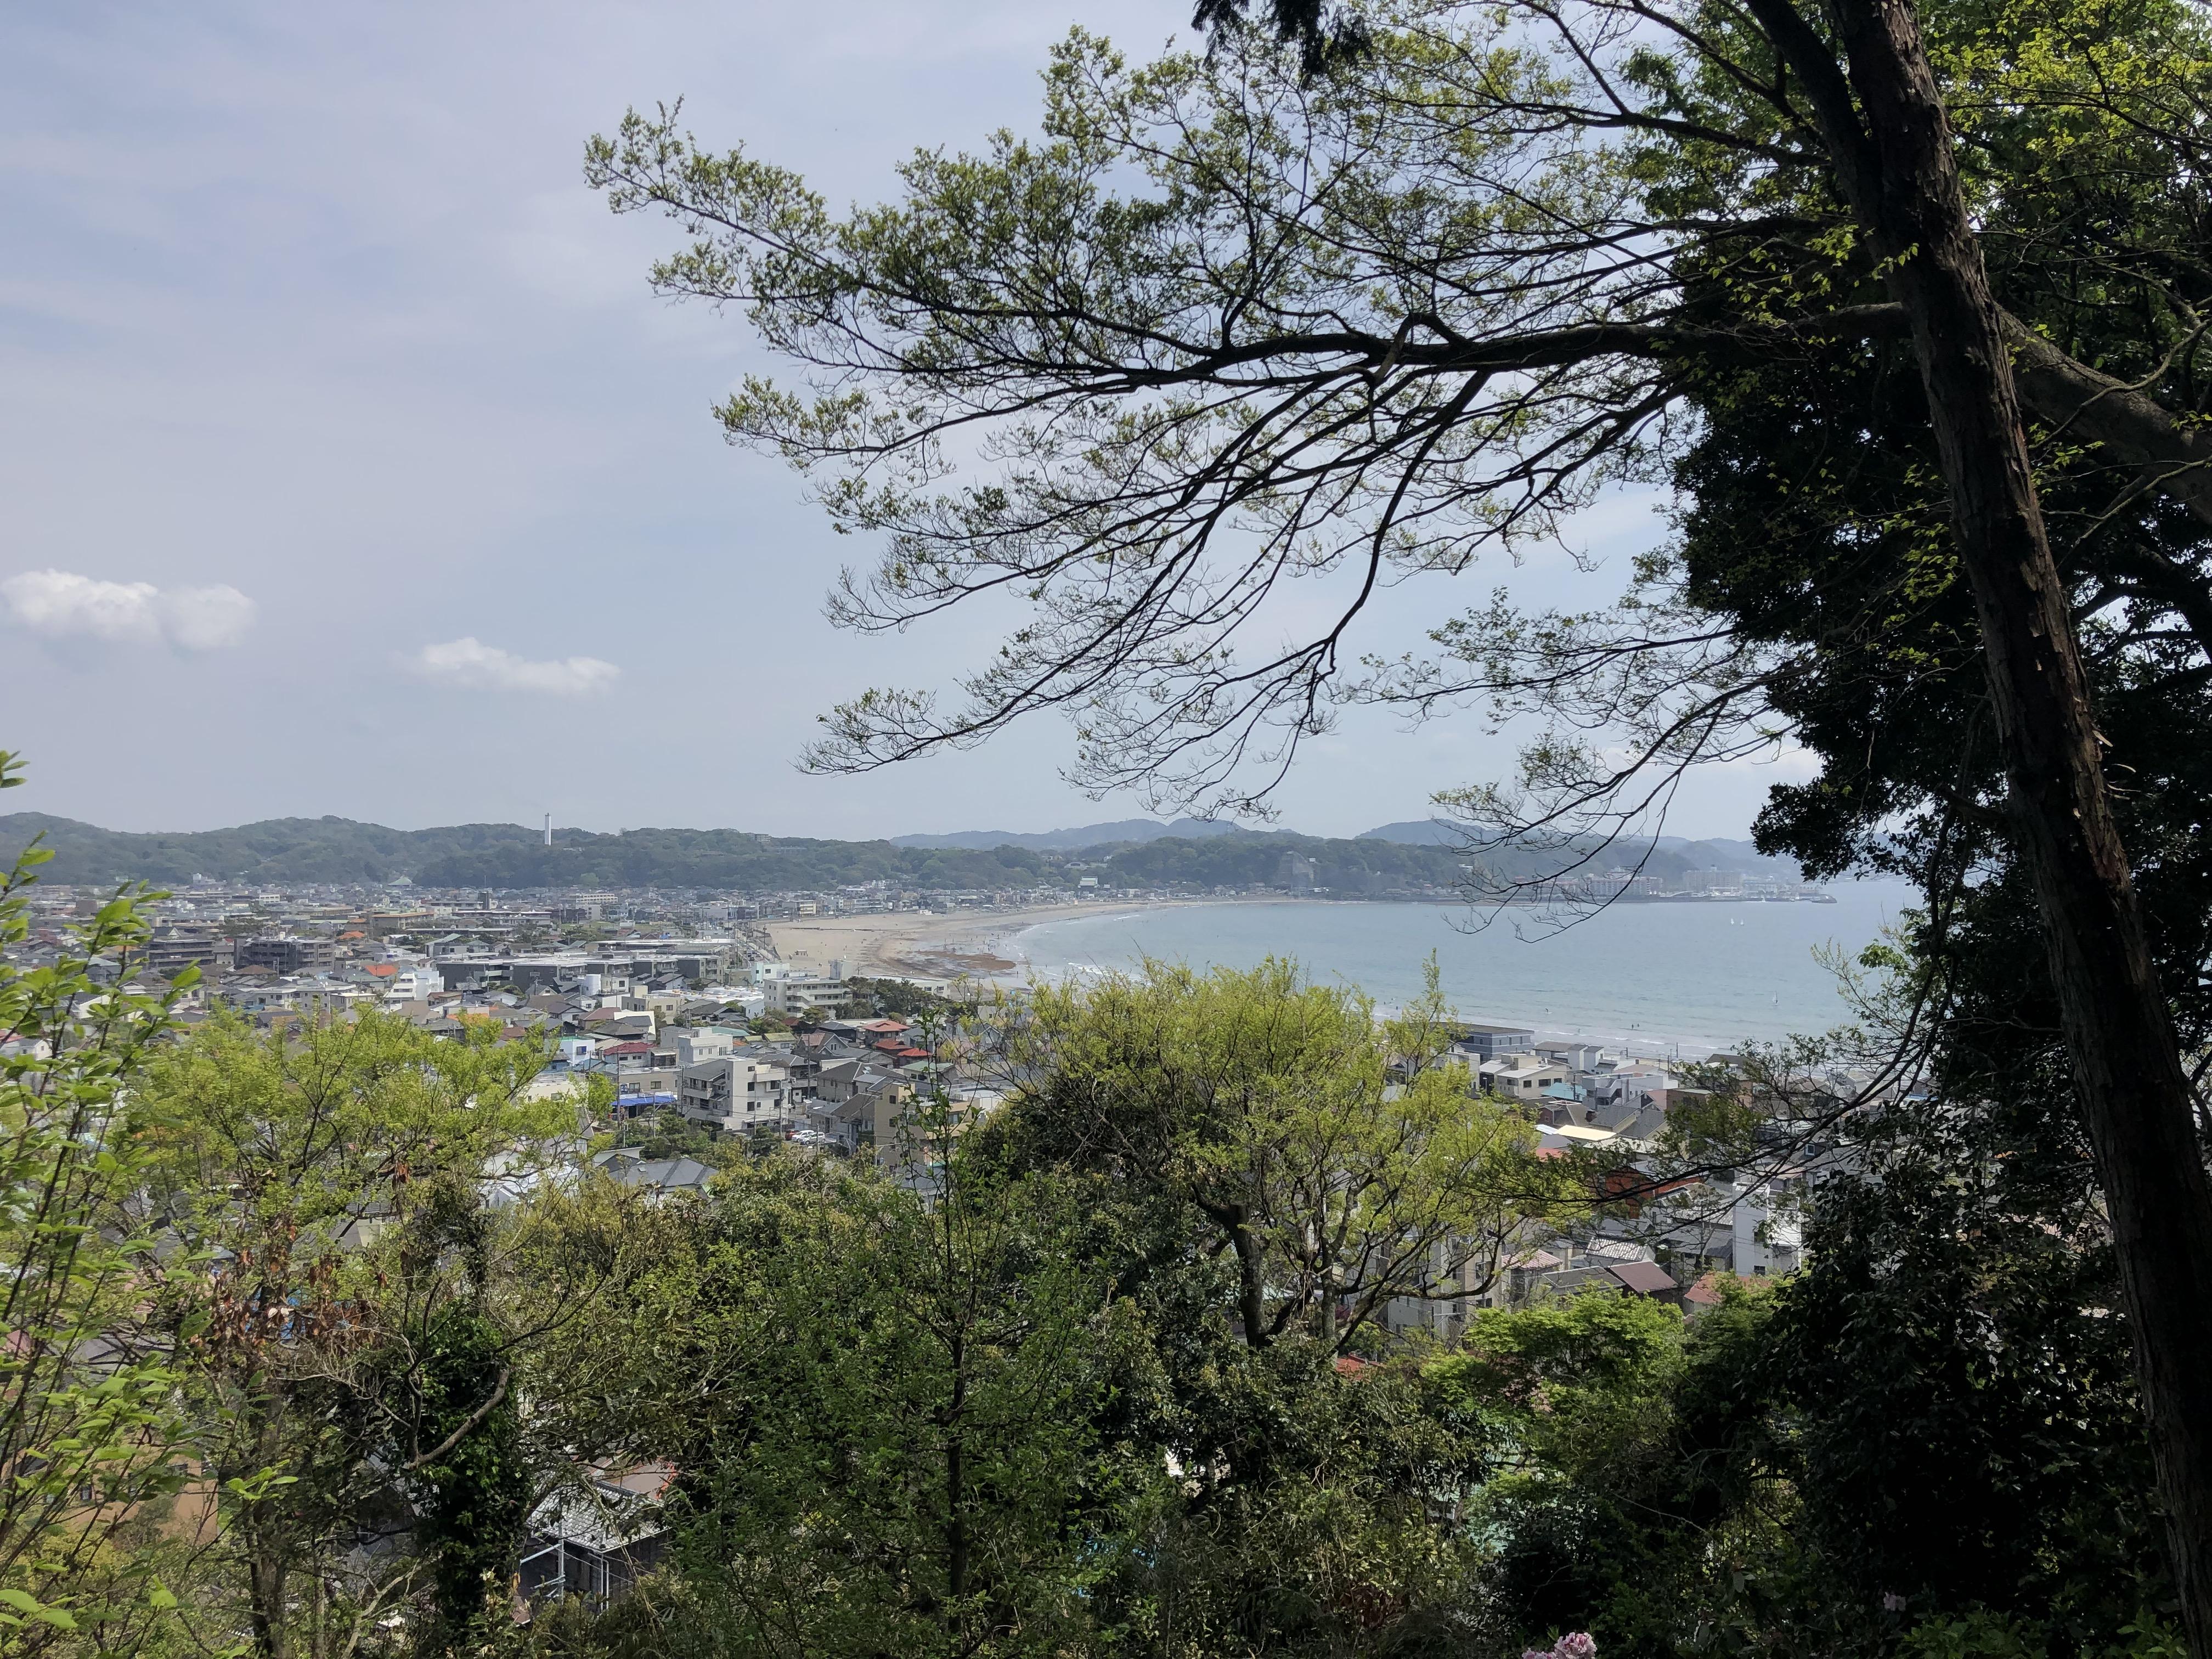 Vista di Kamakura dal tempio Hasedera